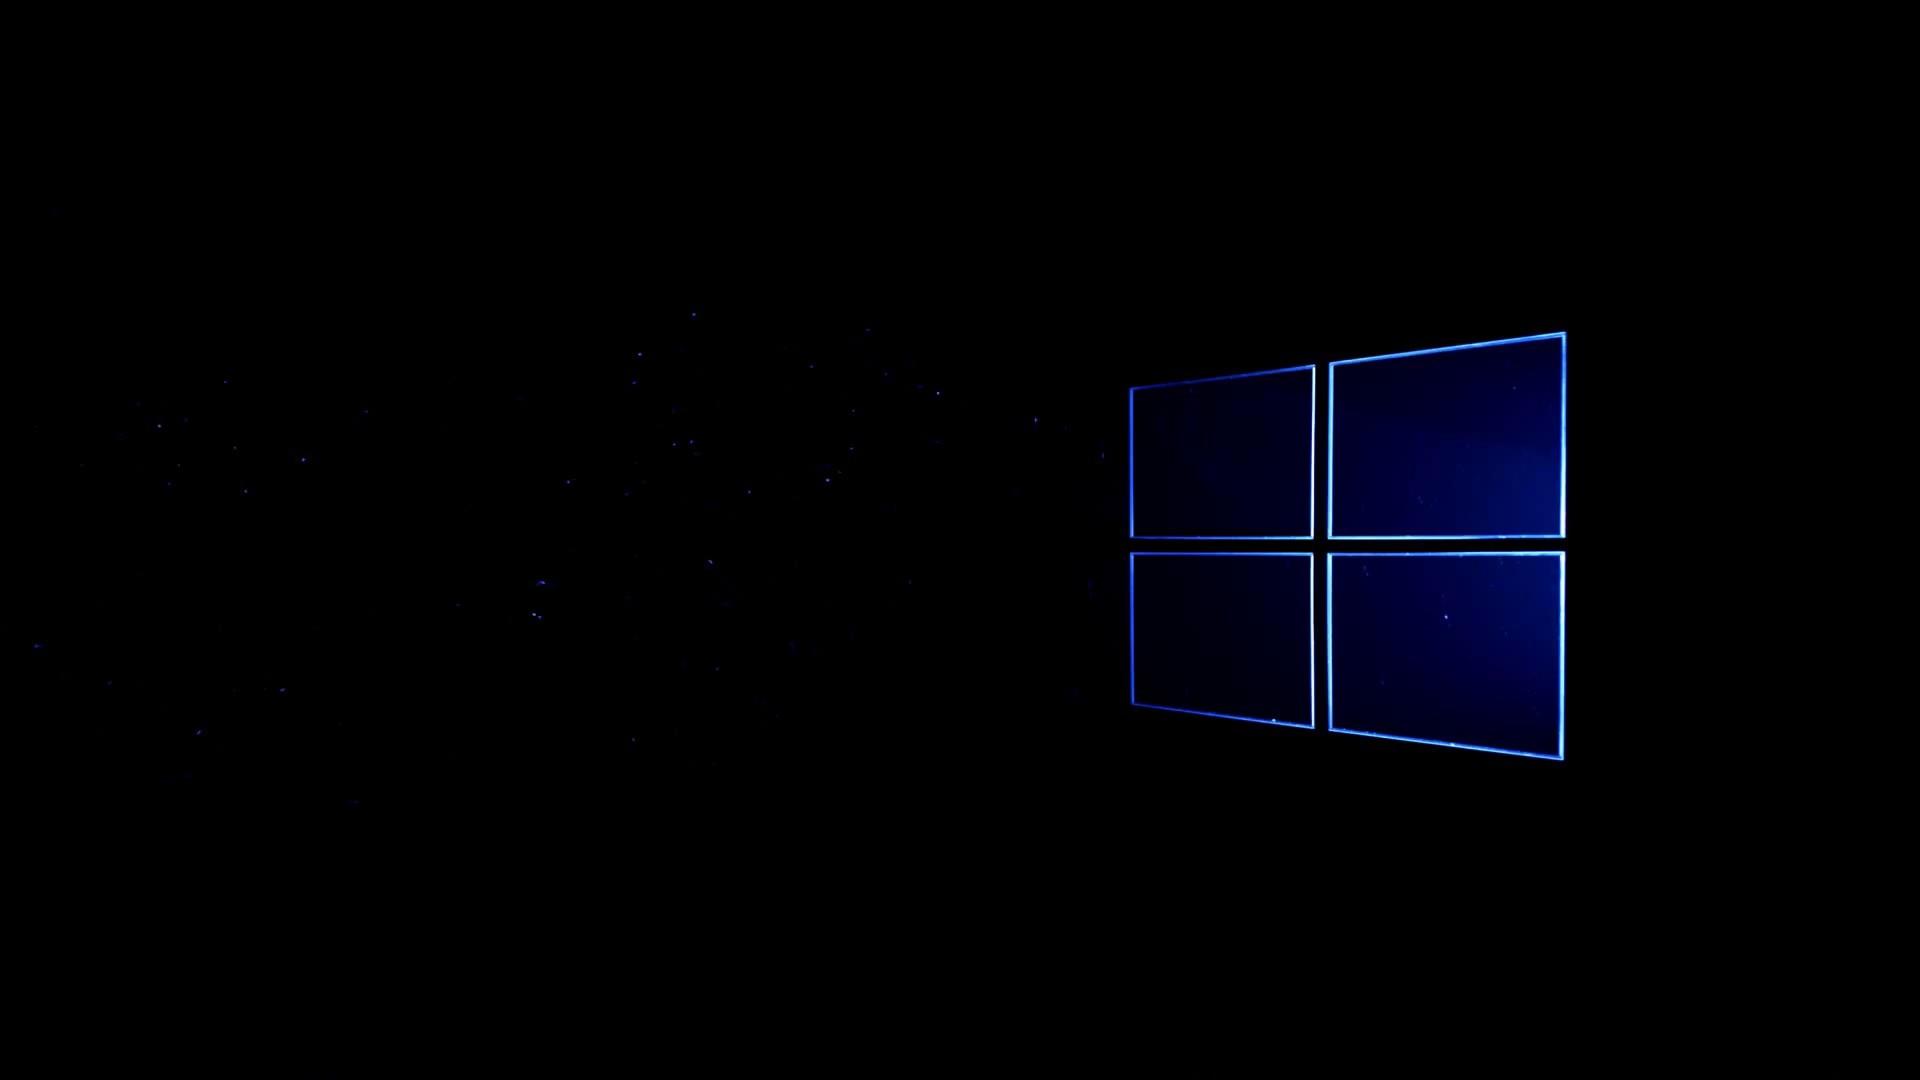 4K Live Wallpaper Windows 10